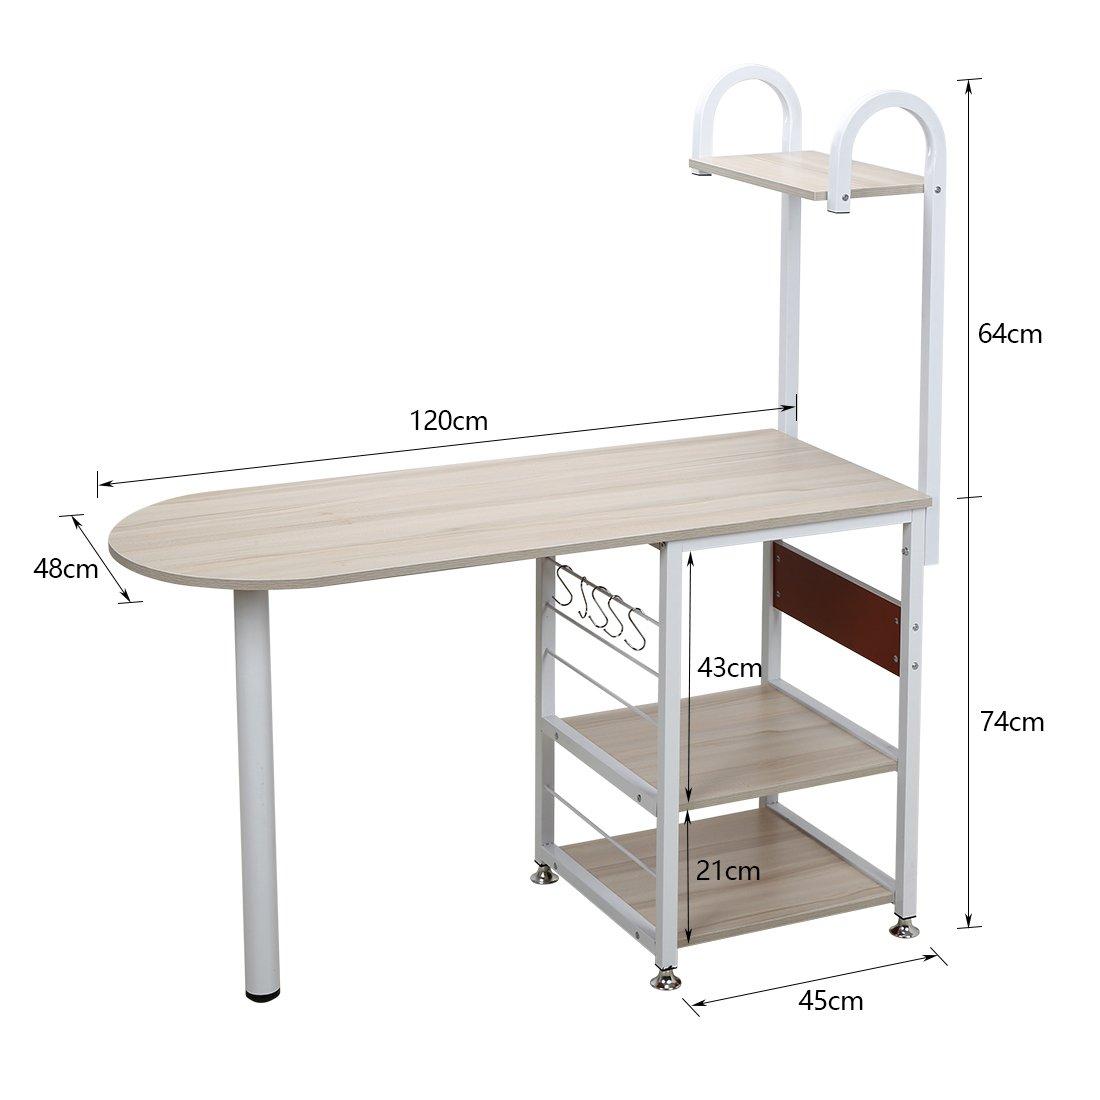 4 Tier Multipurpose Storage Shelf Bakers Rack, Metal Frame and Wooden Worktop for Kitchen by BestValue GO (Image #6)